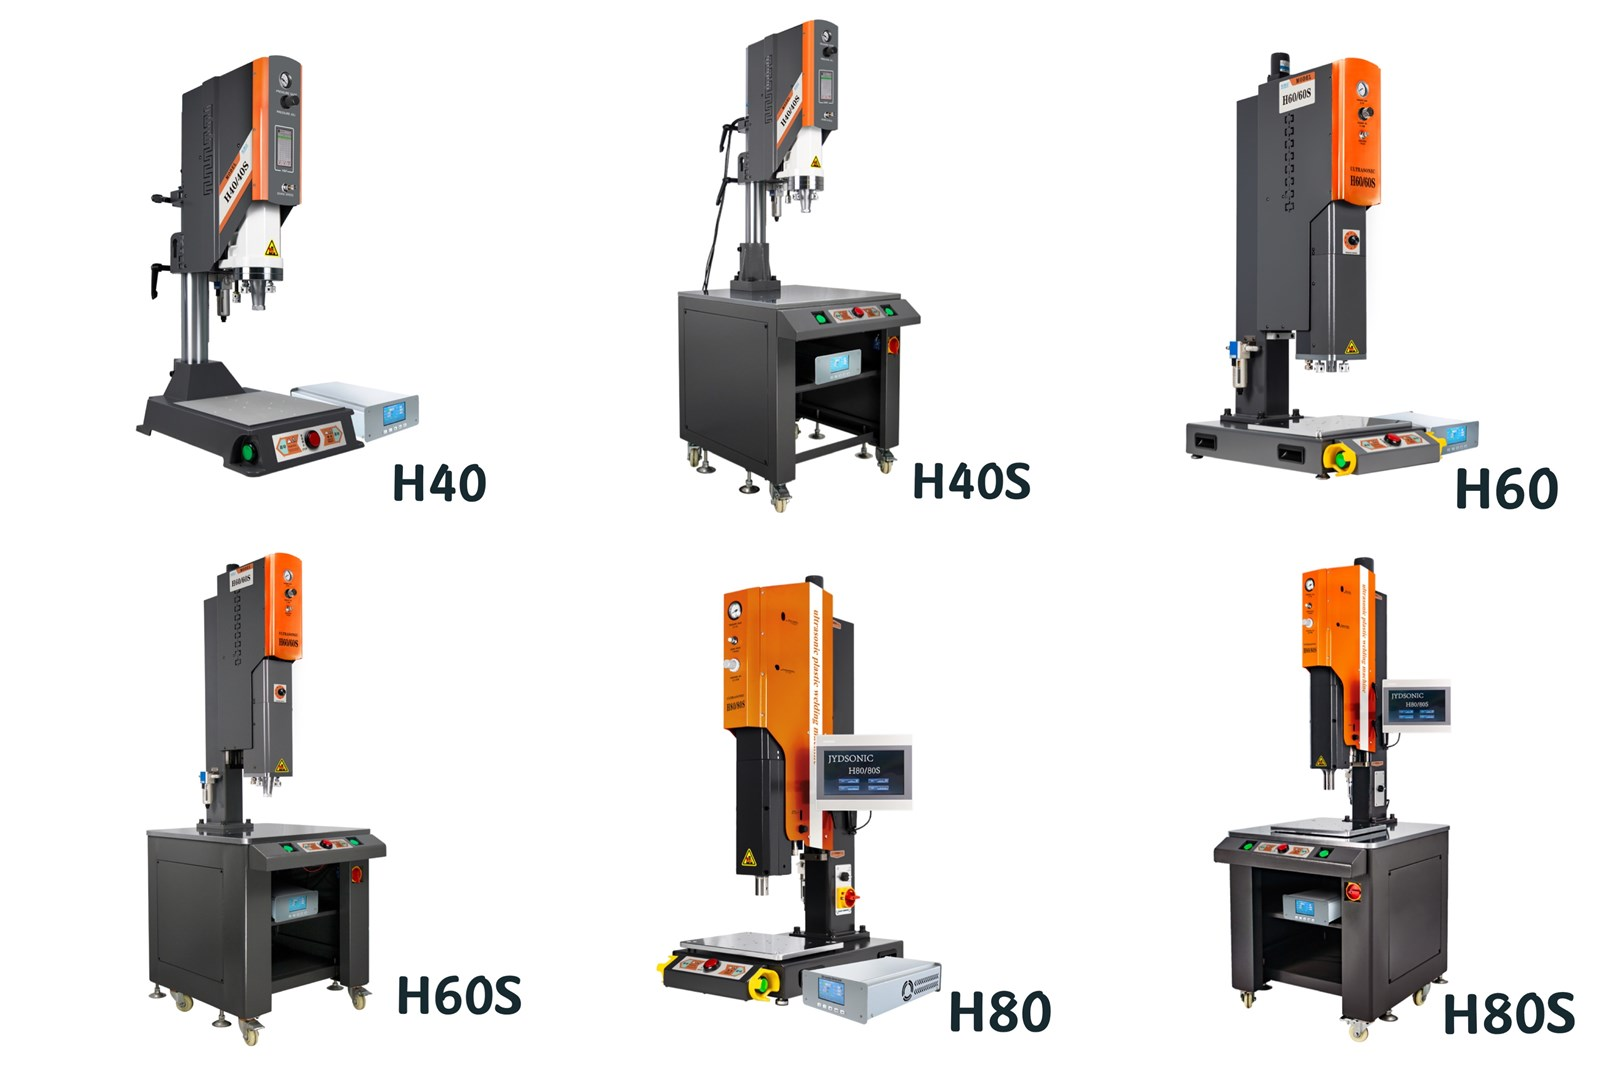 H60 Highprecision Repeatable Positioning 800W 1200W 2500W 3000W Ultrasonic Desktop Plastic Welding Machine